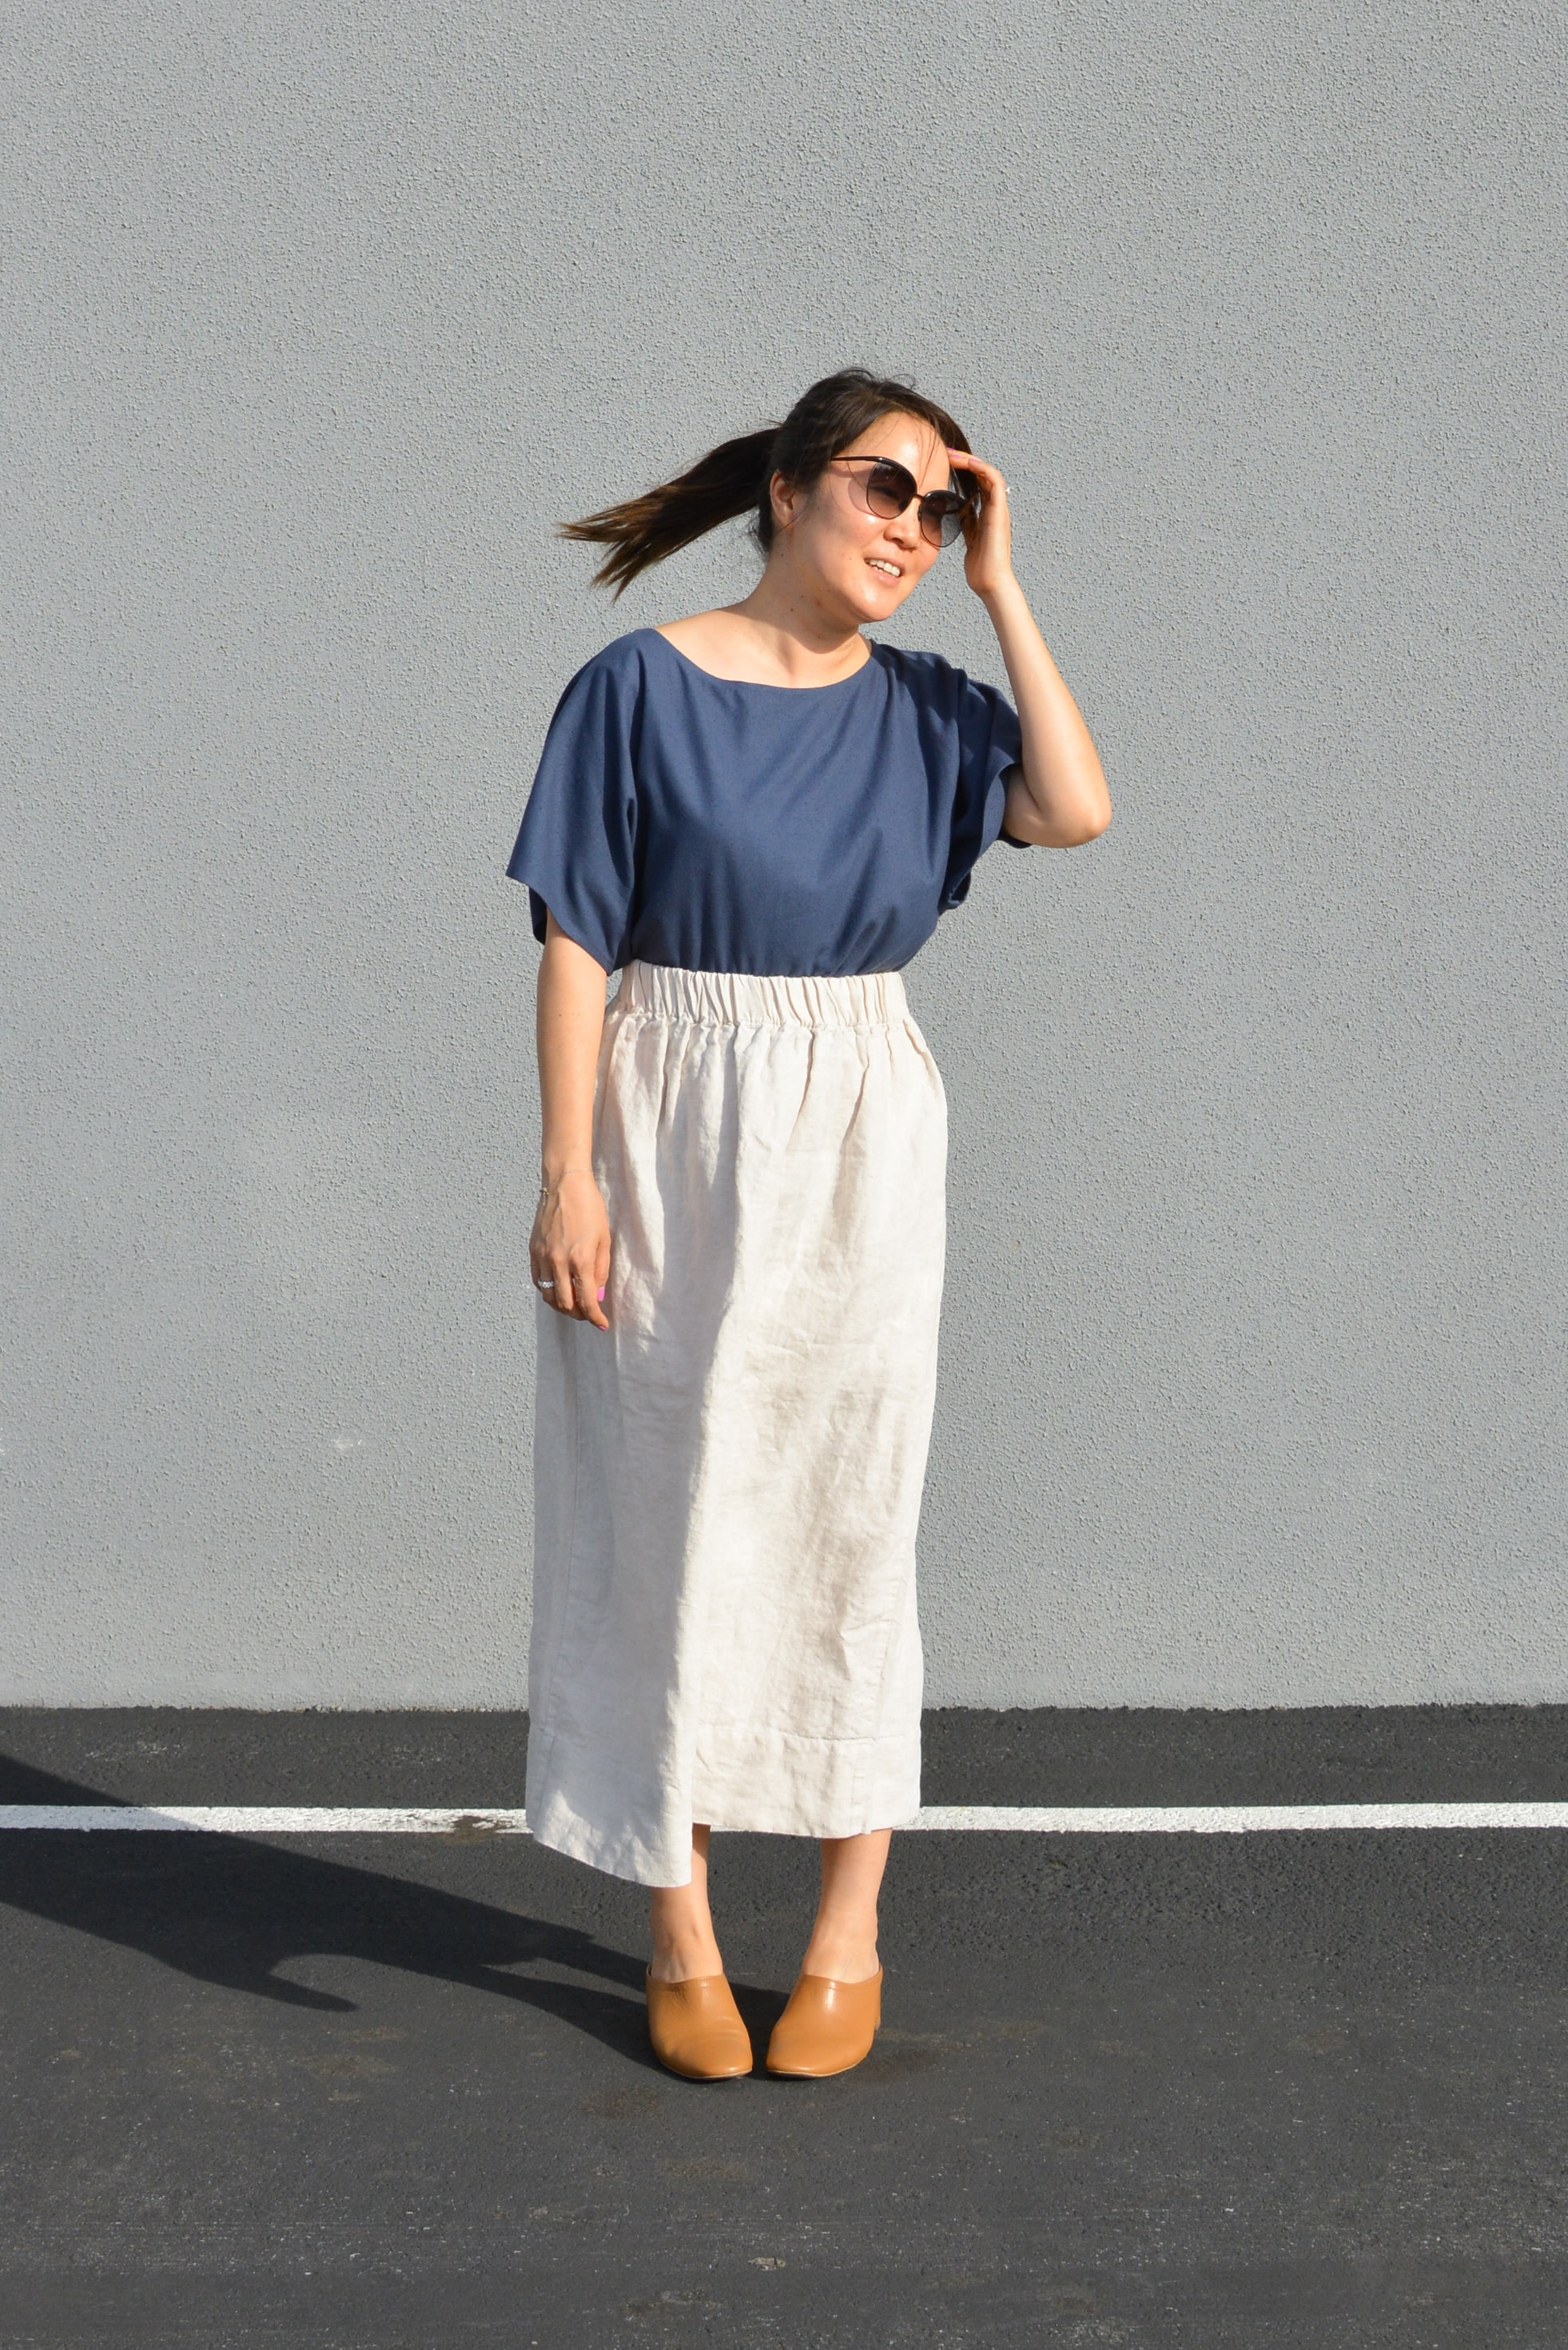 Elizabeth Suzann Review Linen Bel Skirt (6 of 6)-min.jpg